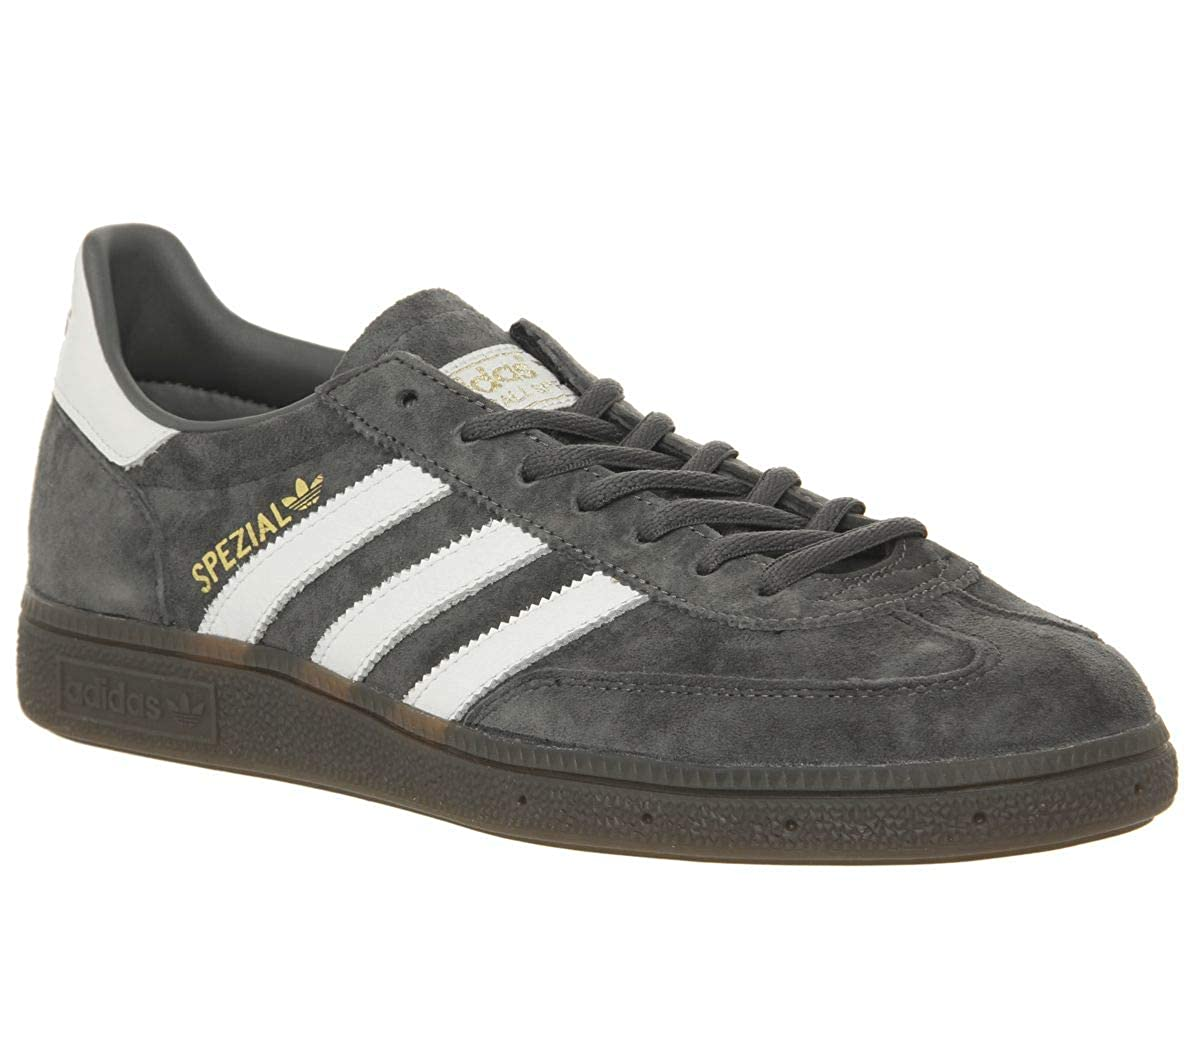 gris (Gricin Ftwbla Gum5 0) adidas Handball Spezial, Chaussures de Fitness Homme 45 1 3 EU